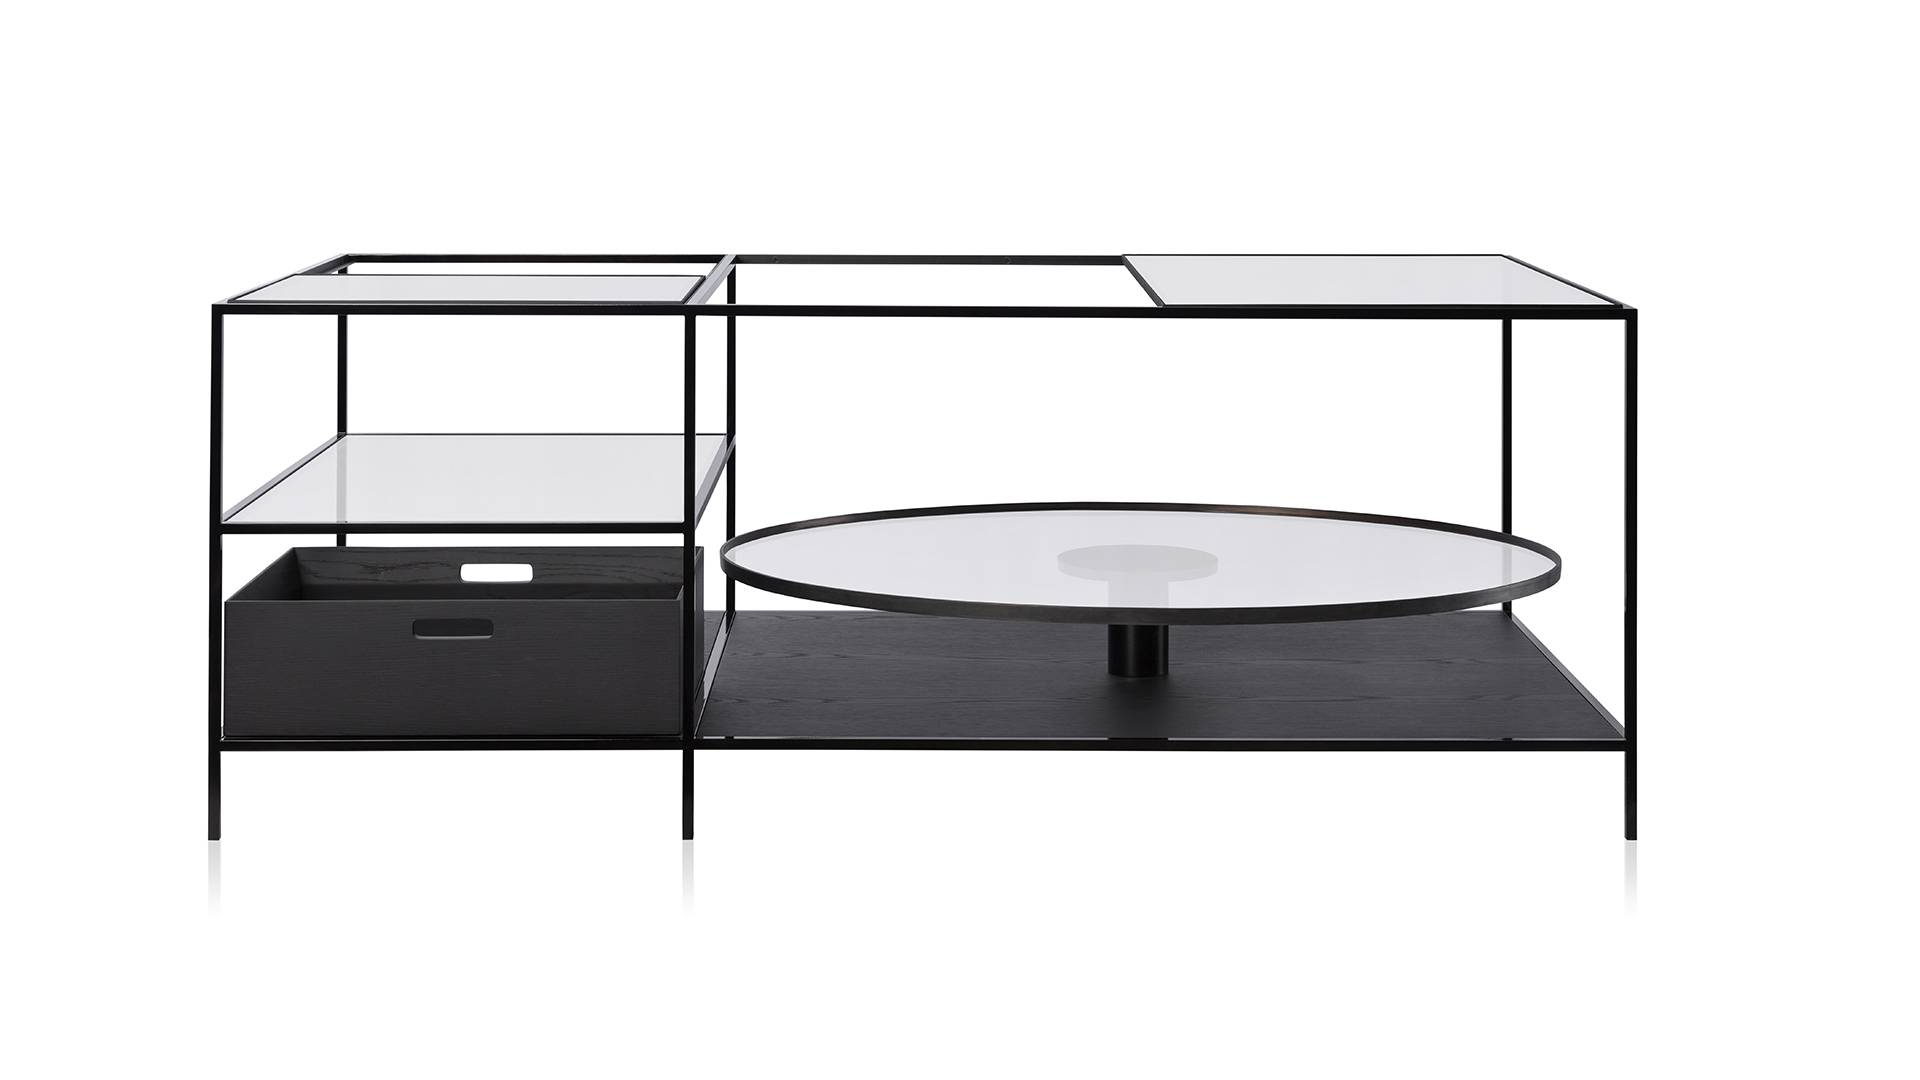 Mesa de centro Teca Bar. Design de Jader Almeida